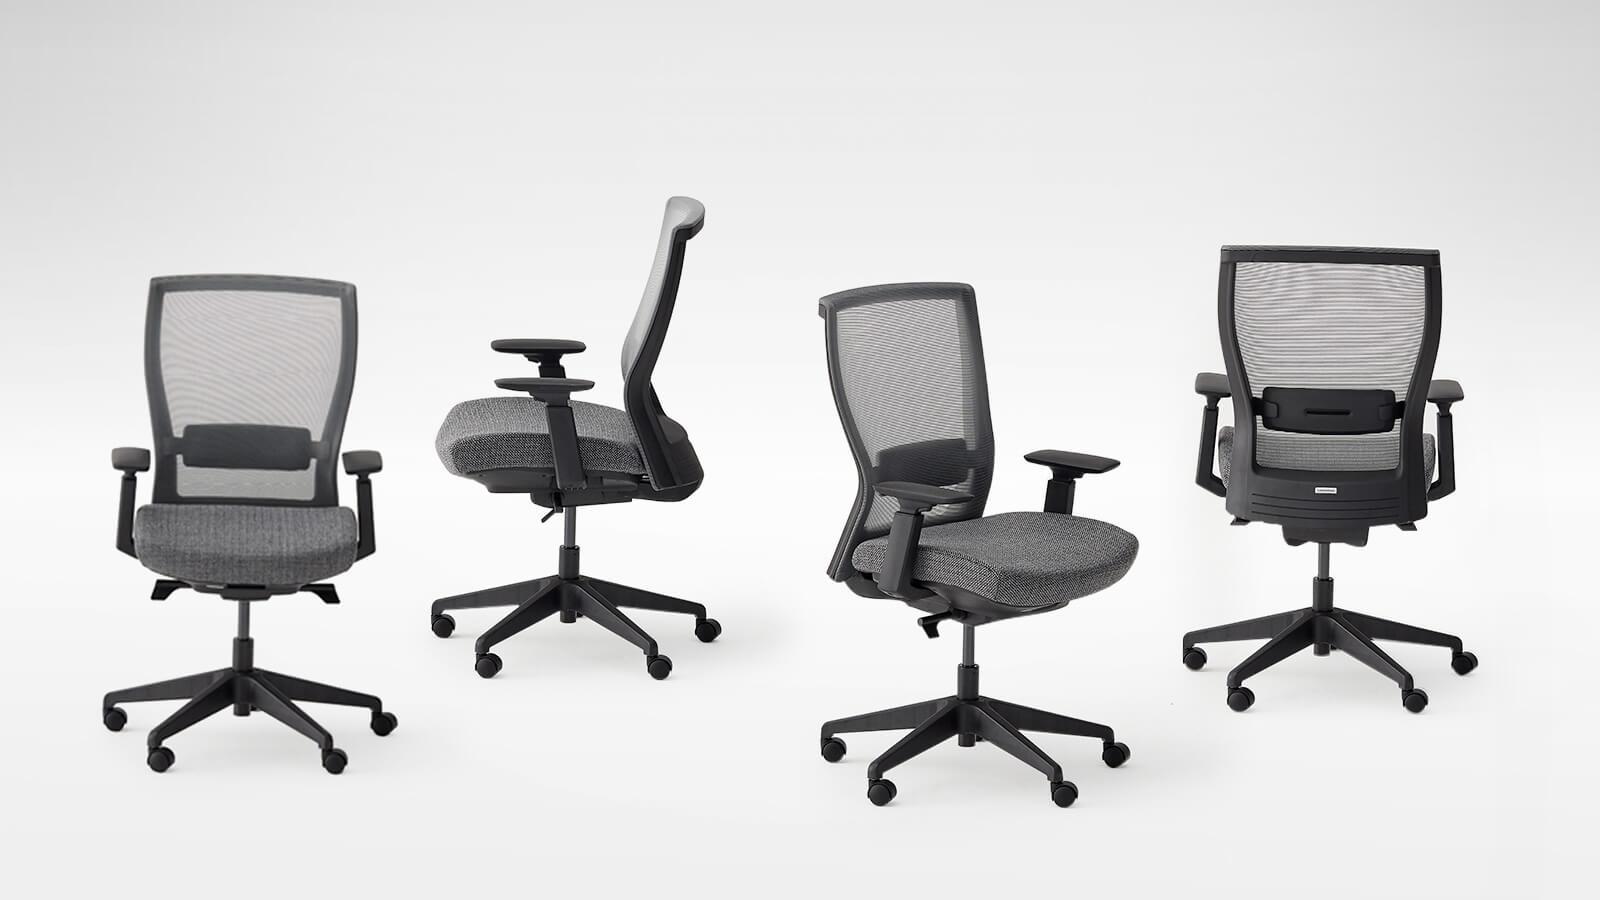 Myochair of autonomous ergonomic office chair